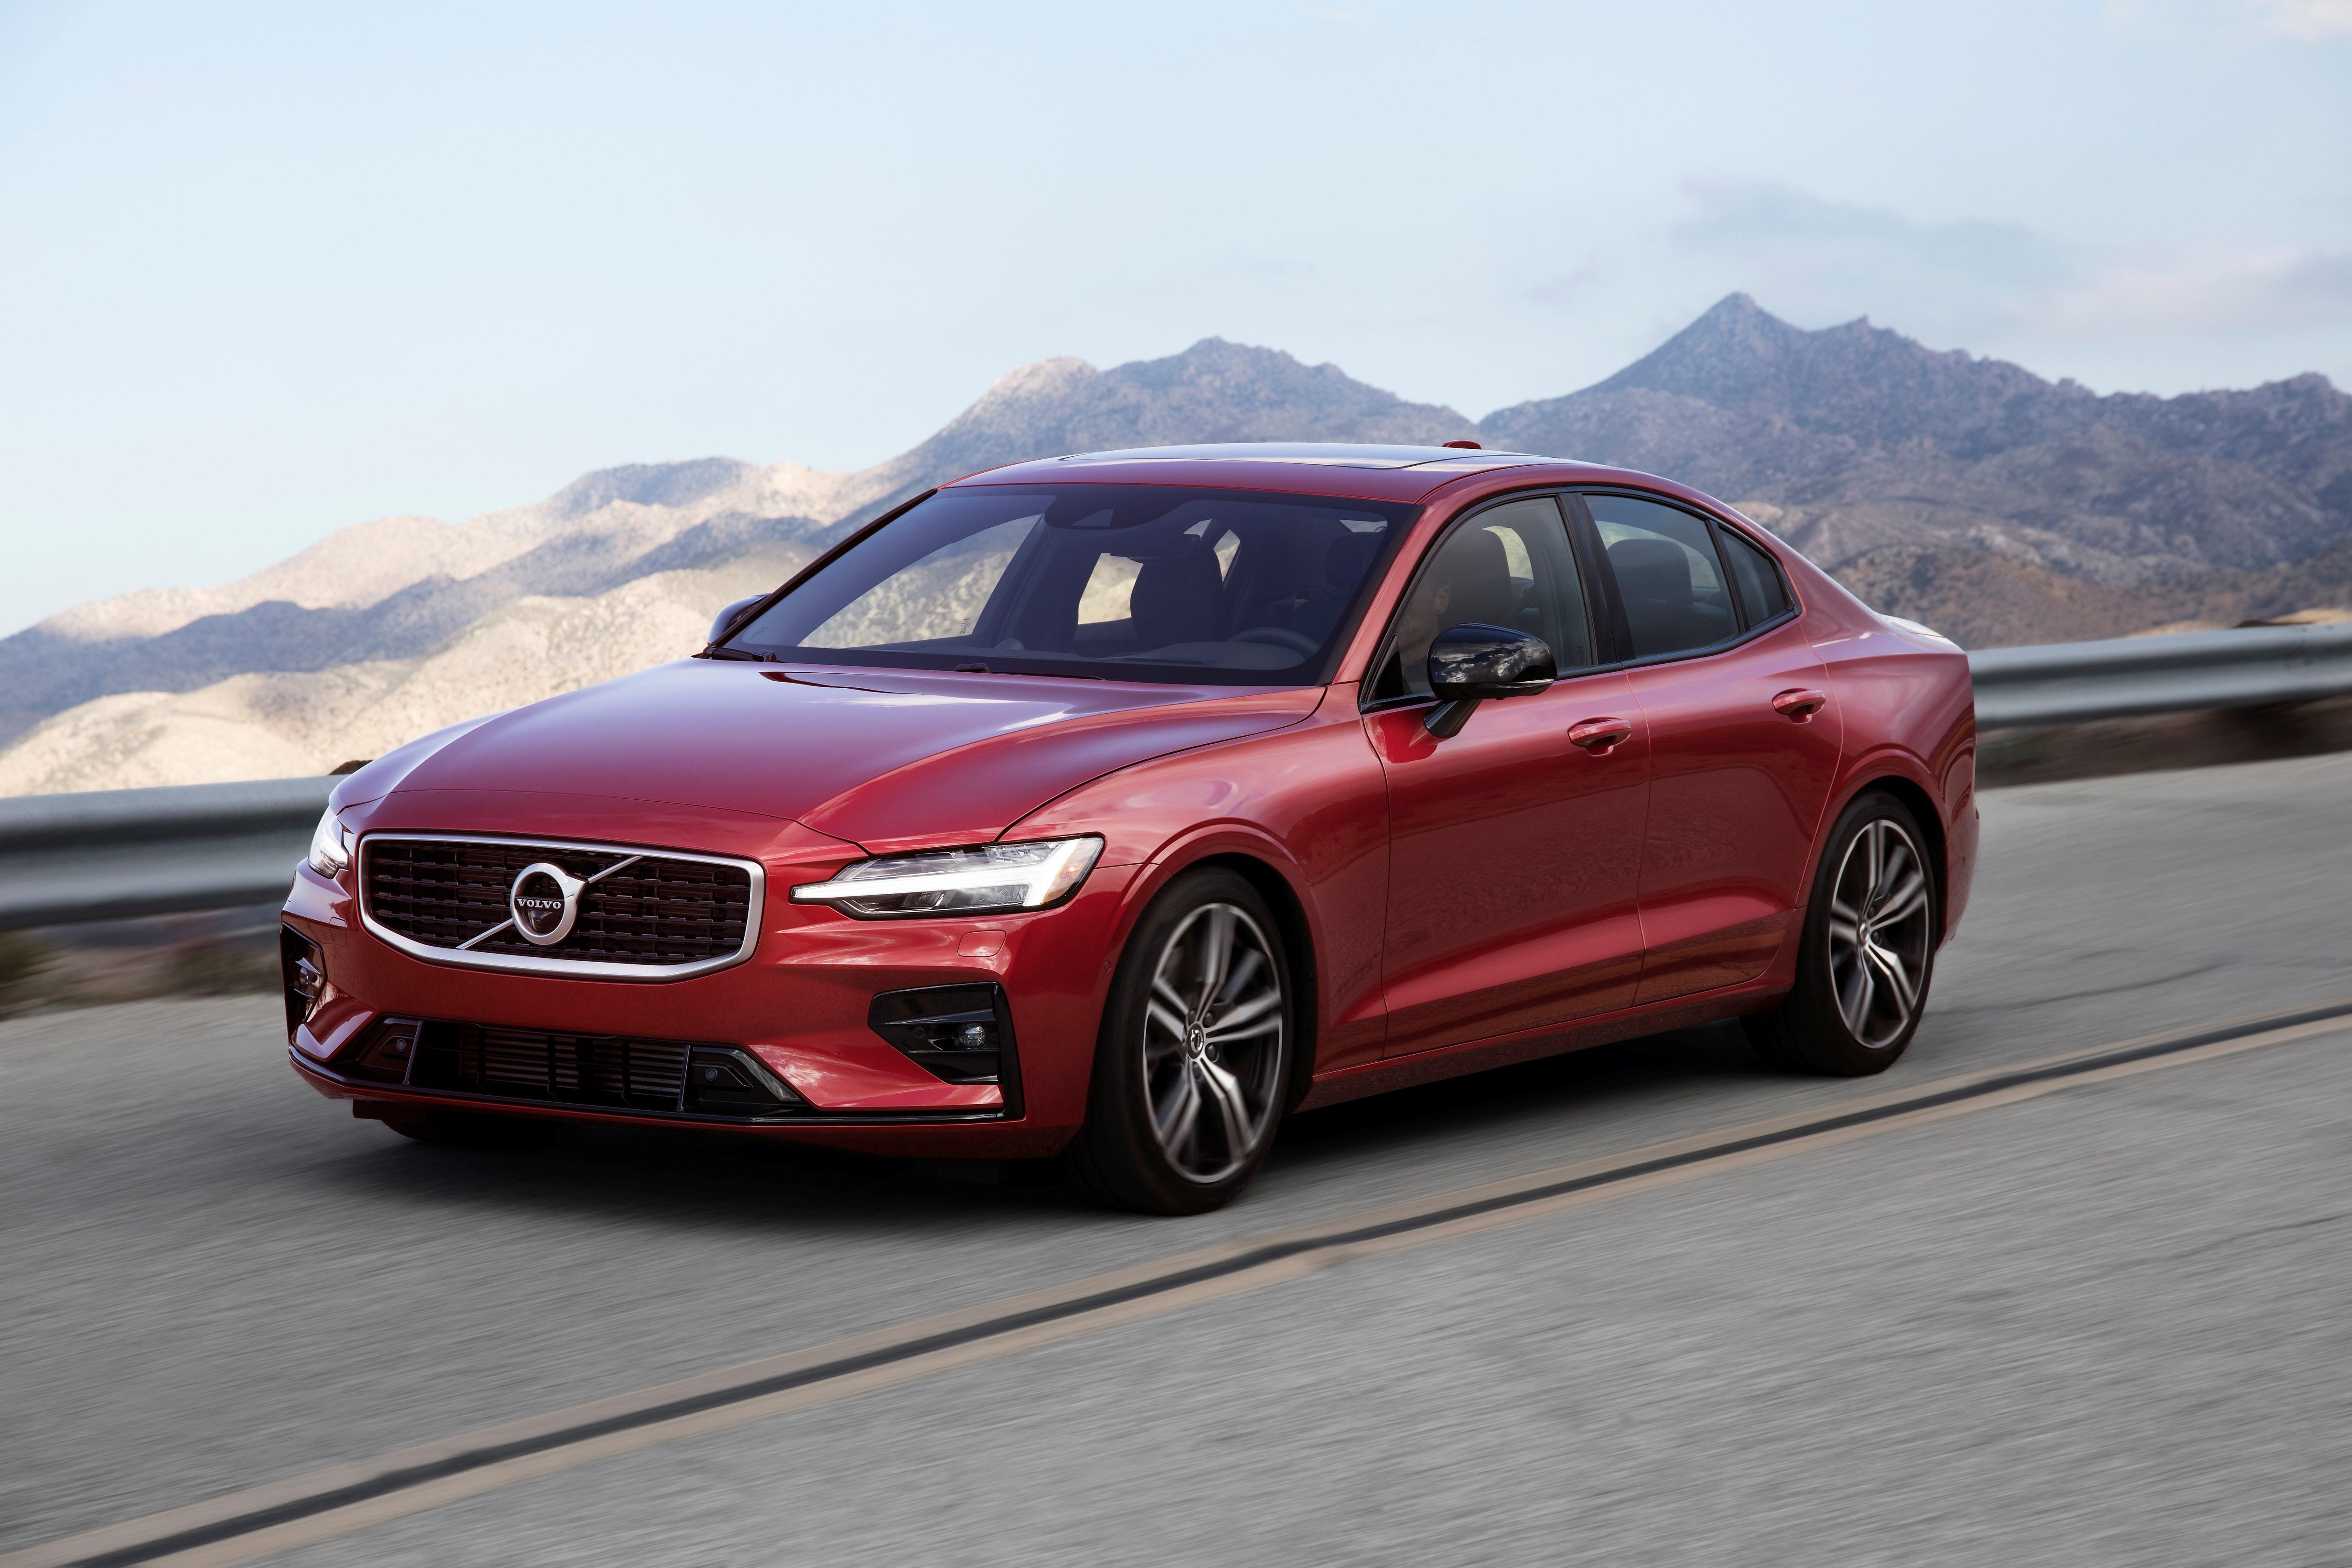 Volvo i samarbeid med Nvidia om autonome biler